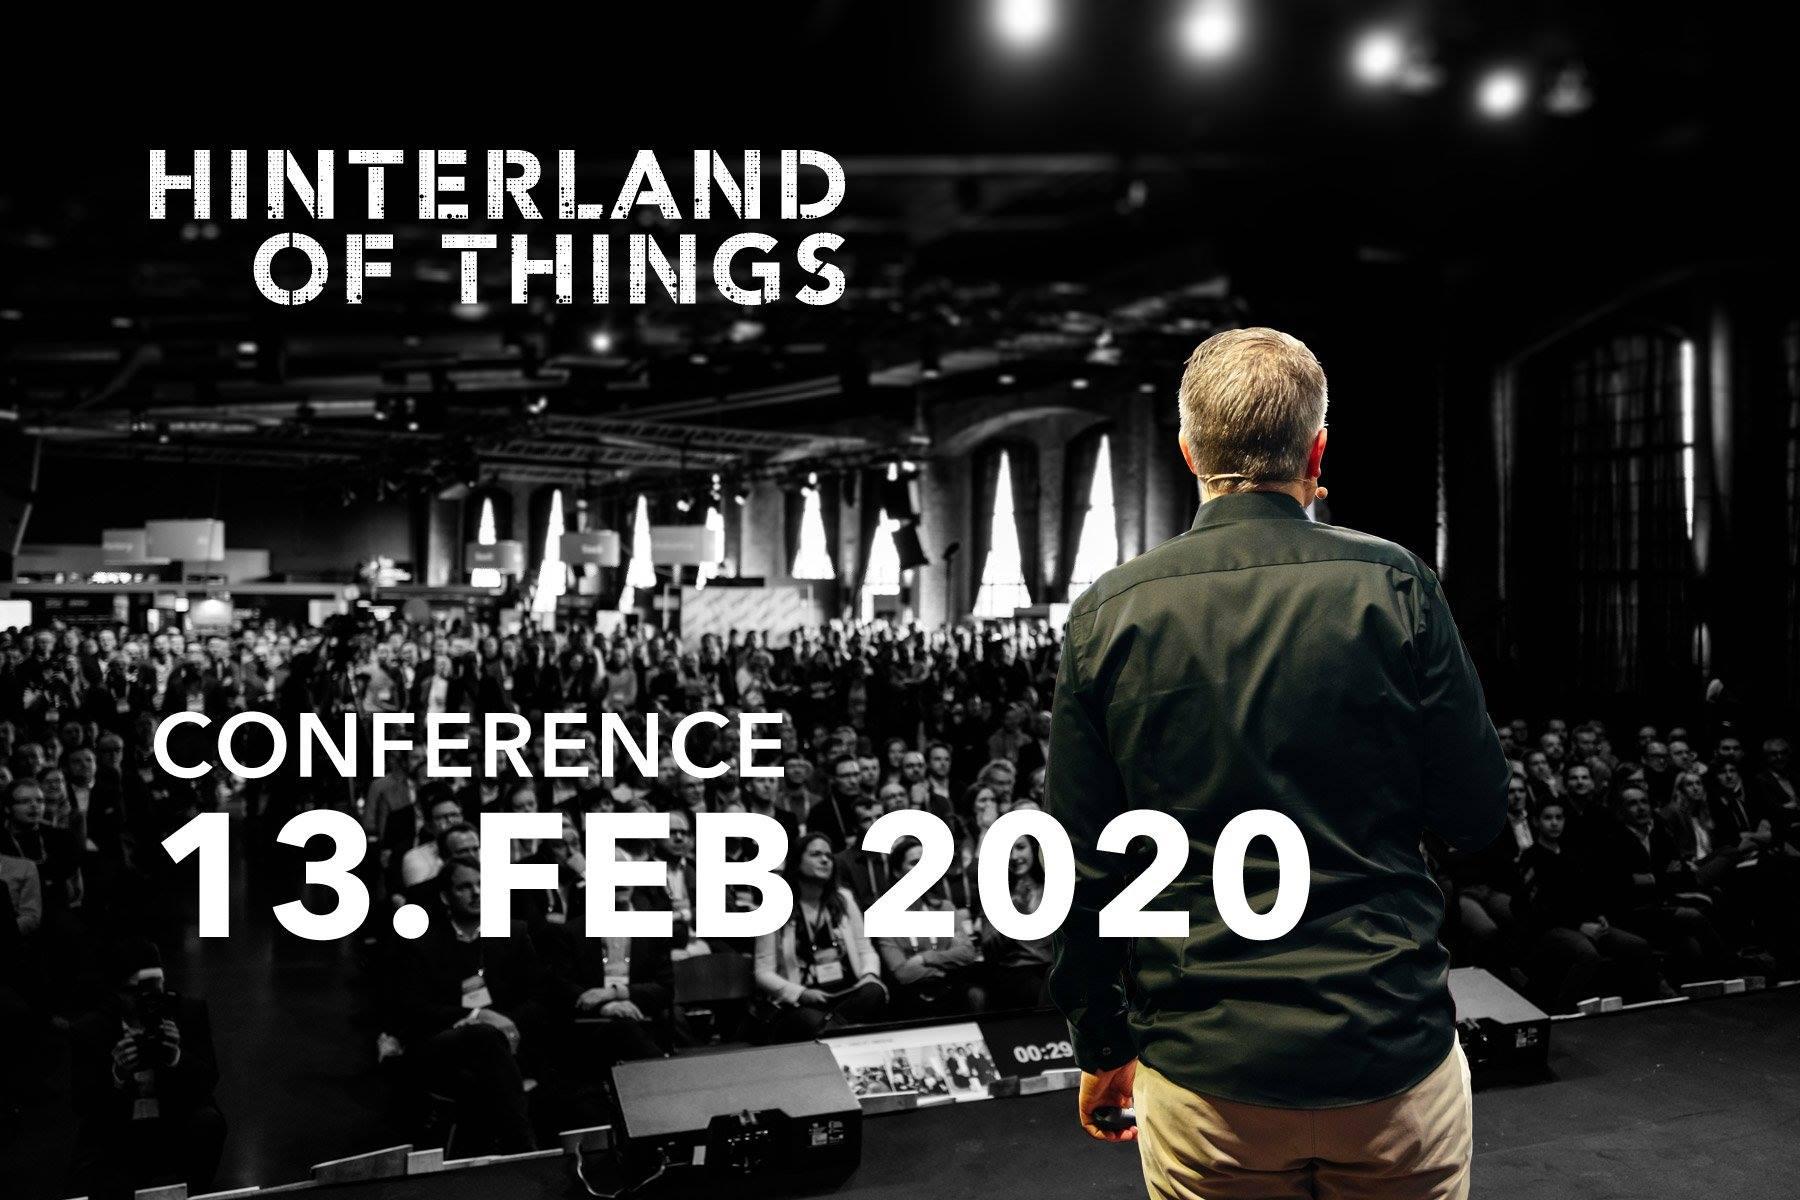 Hinterland of Things